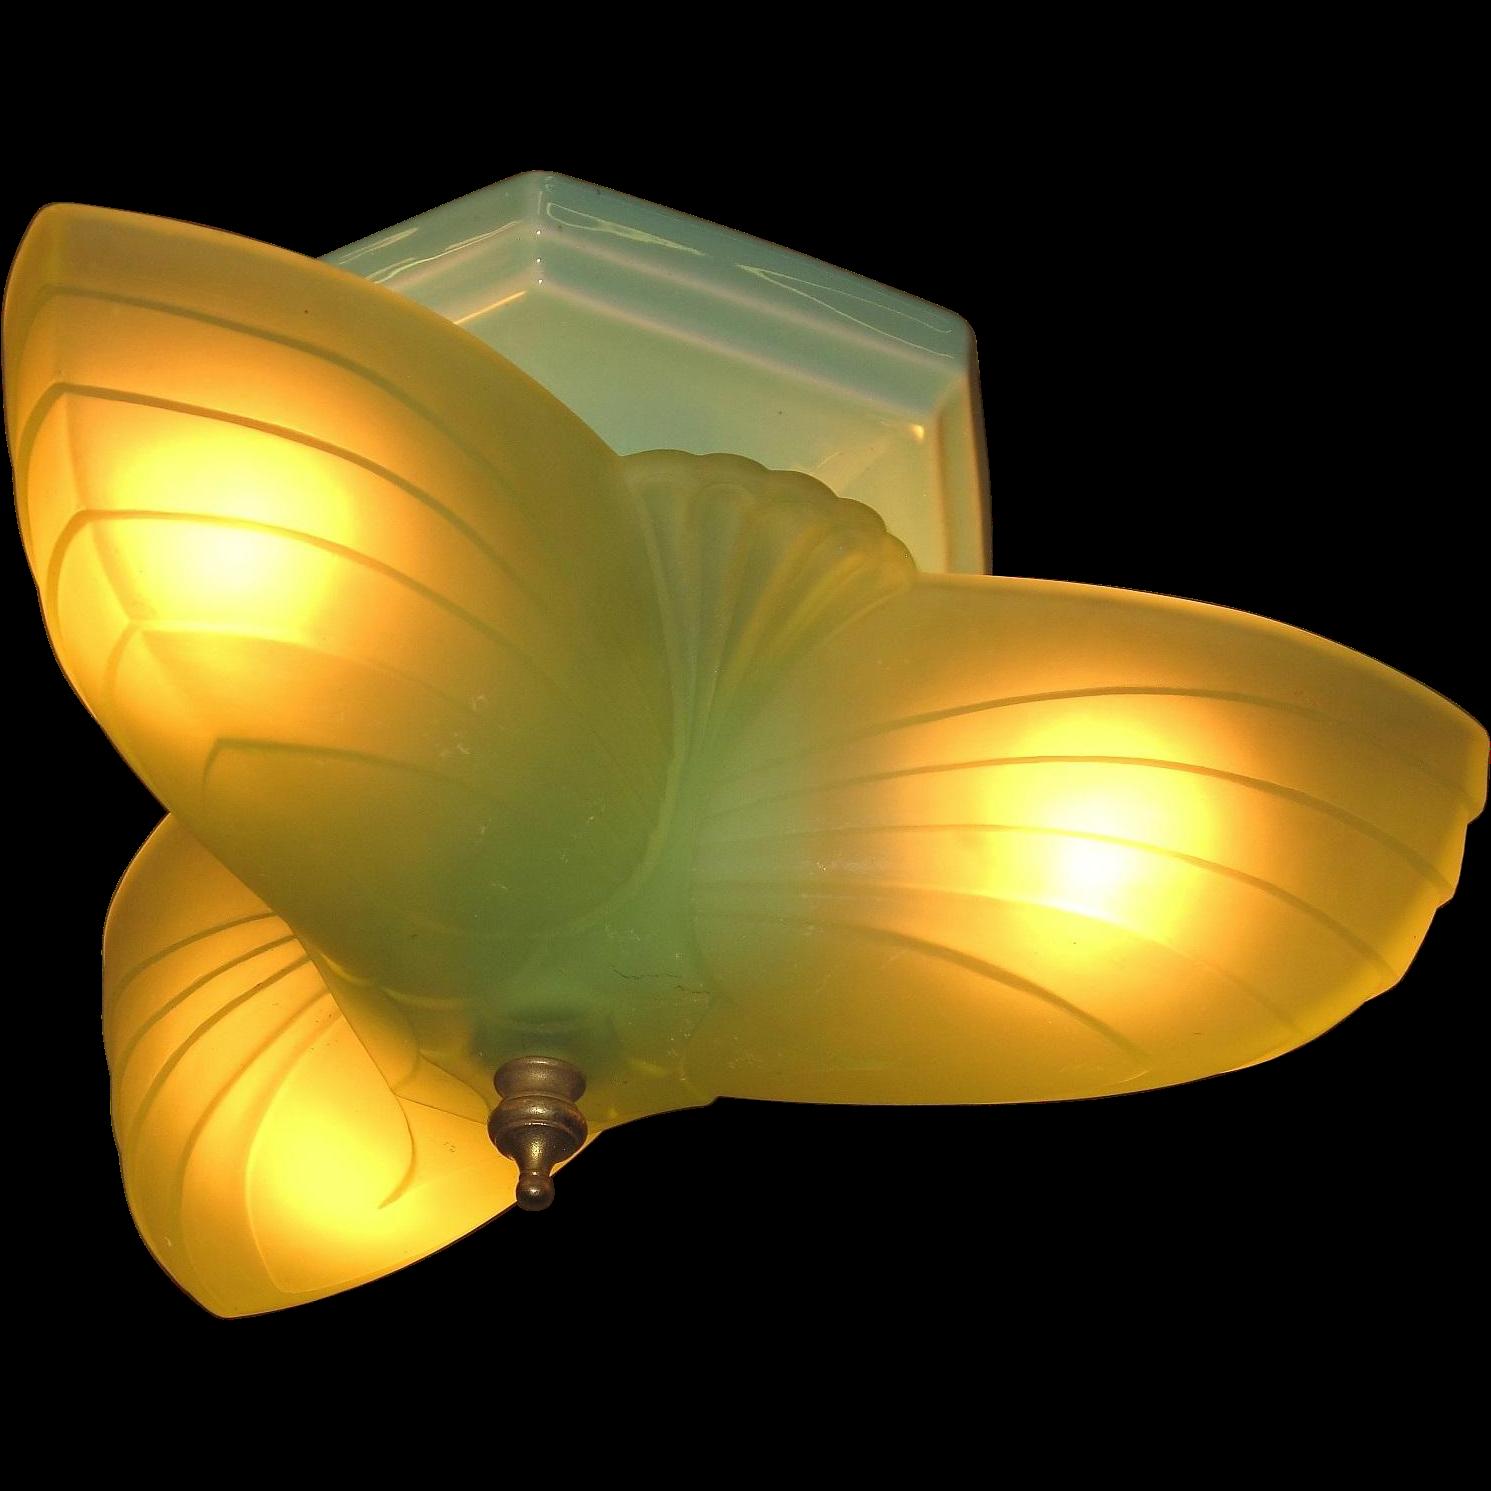 Green 3 Light Flush Mount Fixture On Seafoam Green Porcelain Vintagelights Online Ruby Lane